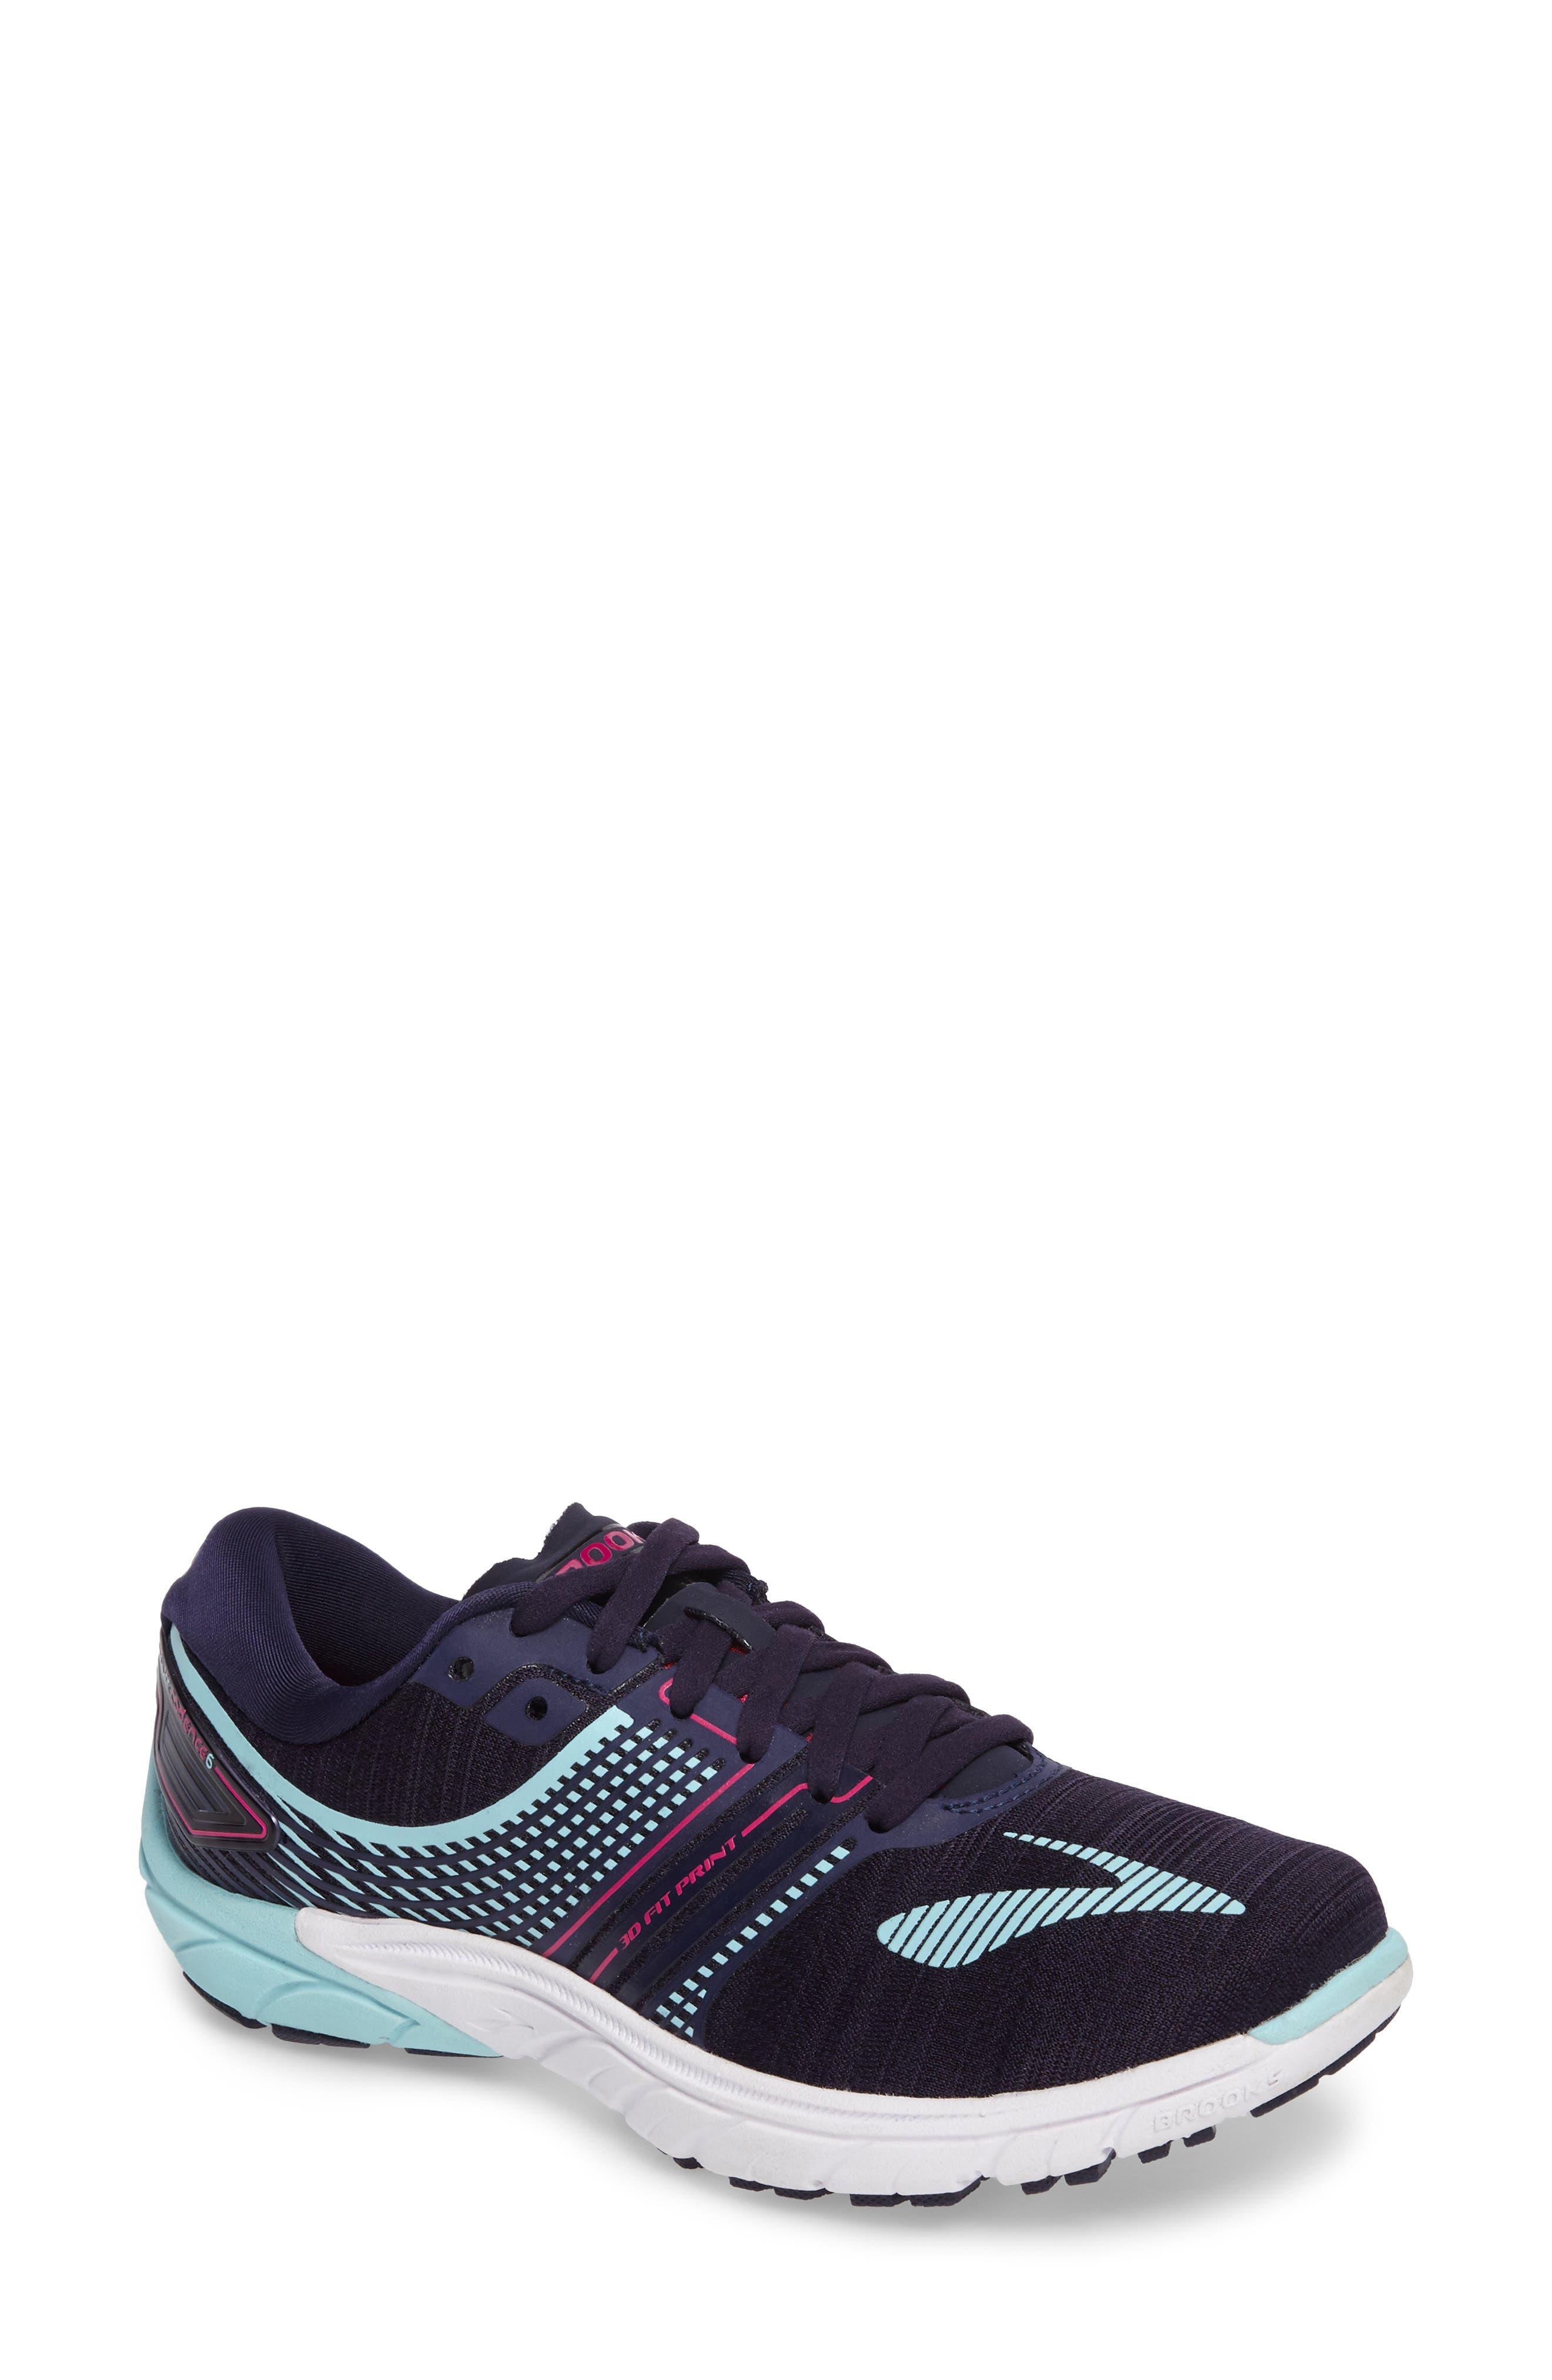 PureCadence 6 Running Shoe,                         Main,                         color, 435